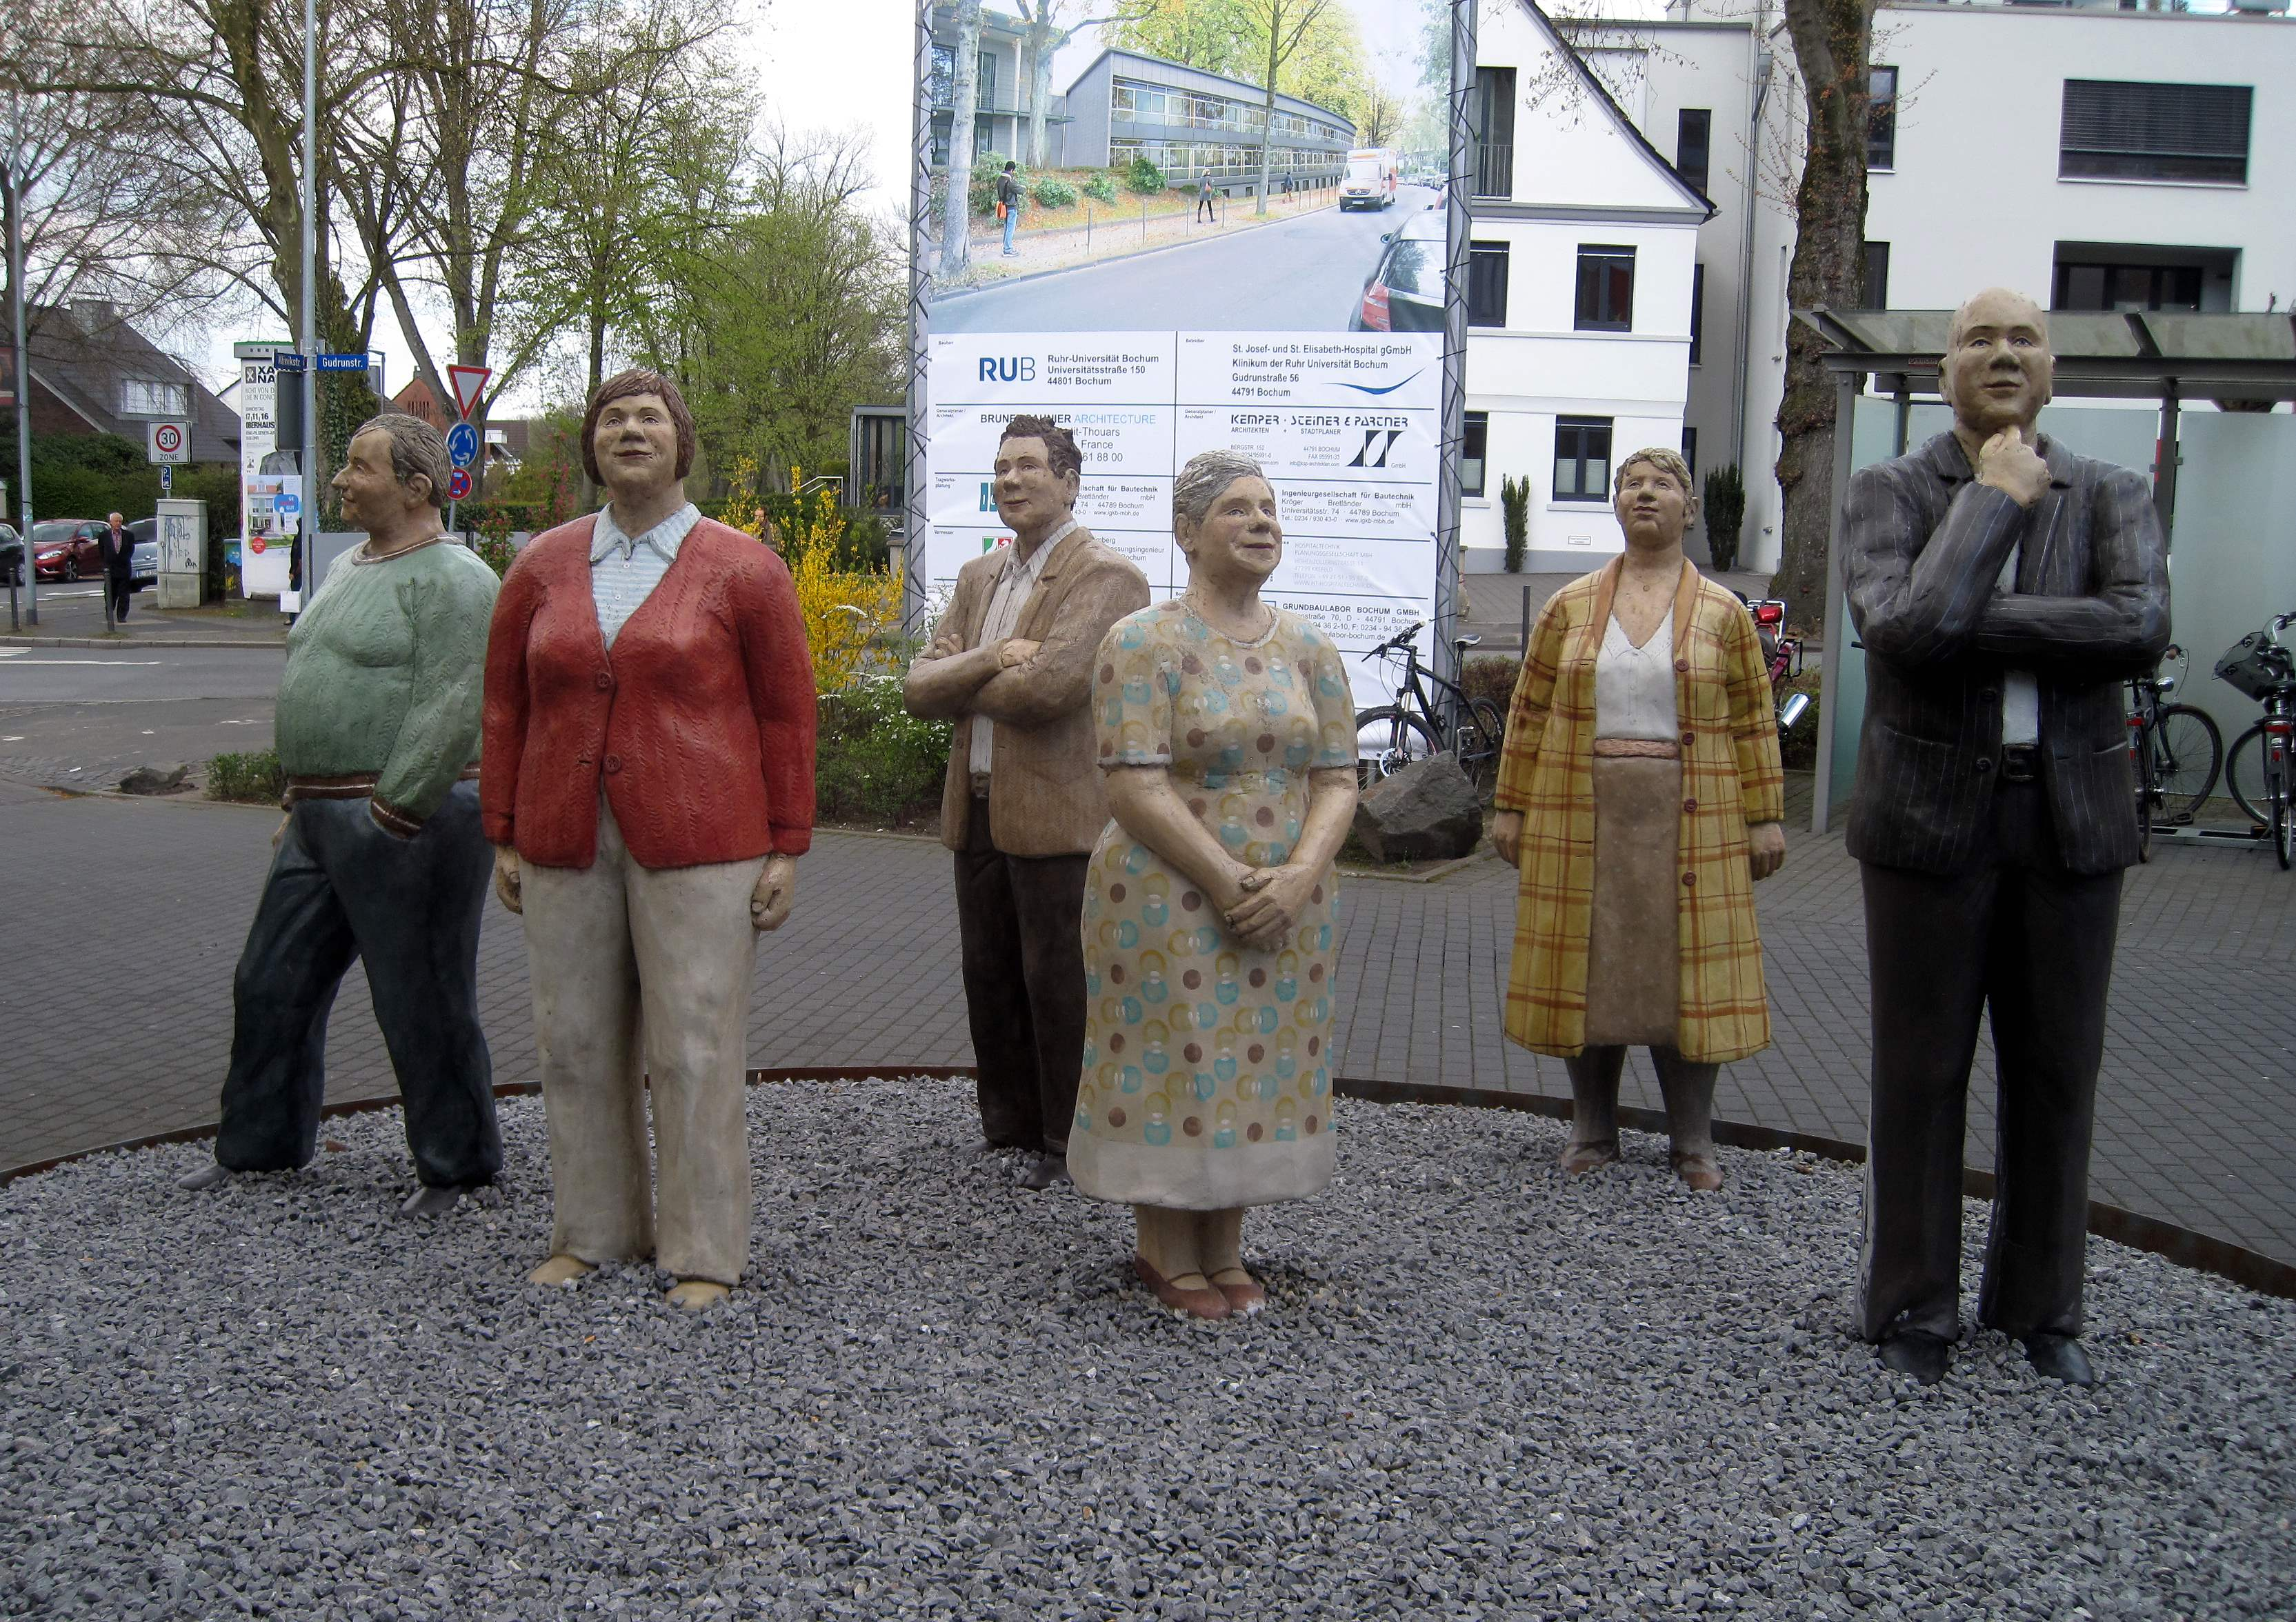 https://upload.wikimedia.org/wikipedia/commons/c/c2/Bochum-Lechnerfiguren1-Asio.jpg